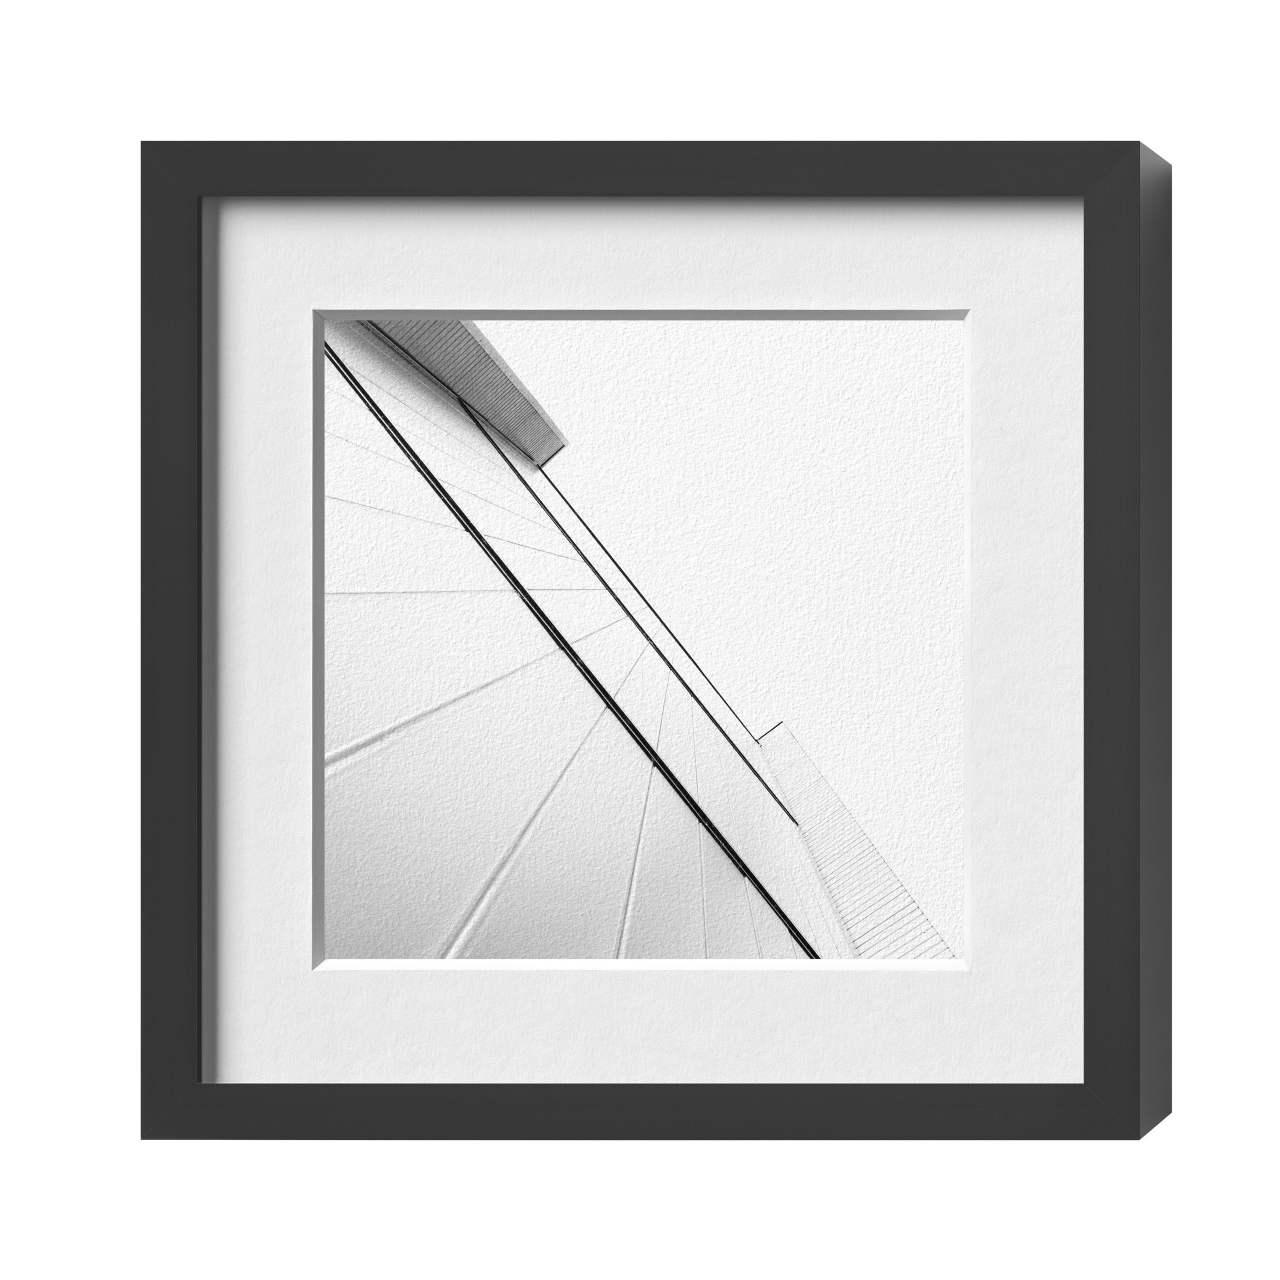 Bilderrahmen für Kunstwerke   HALBE Protect-Magnetrahmen